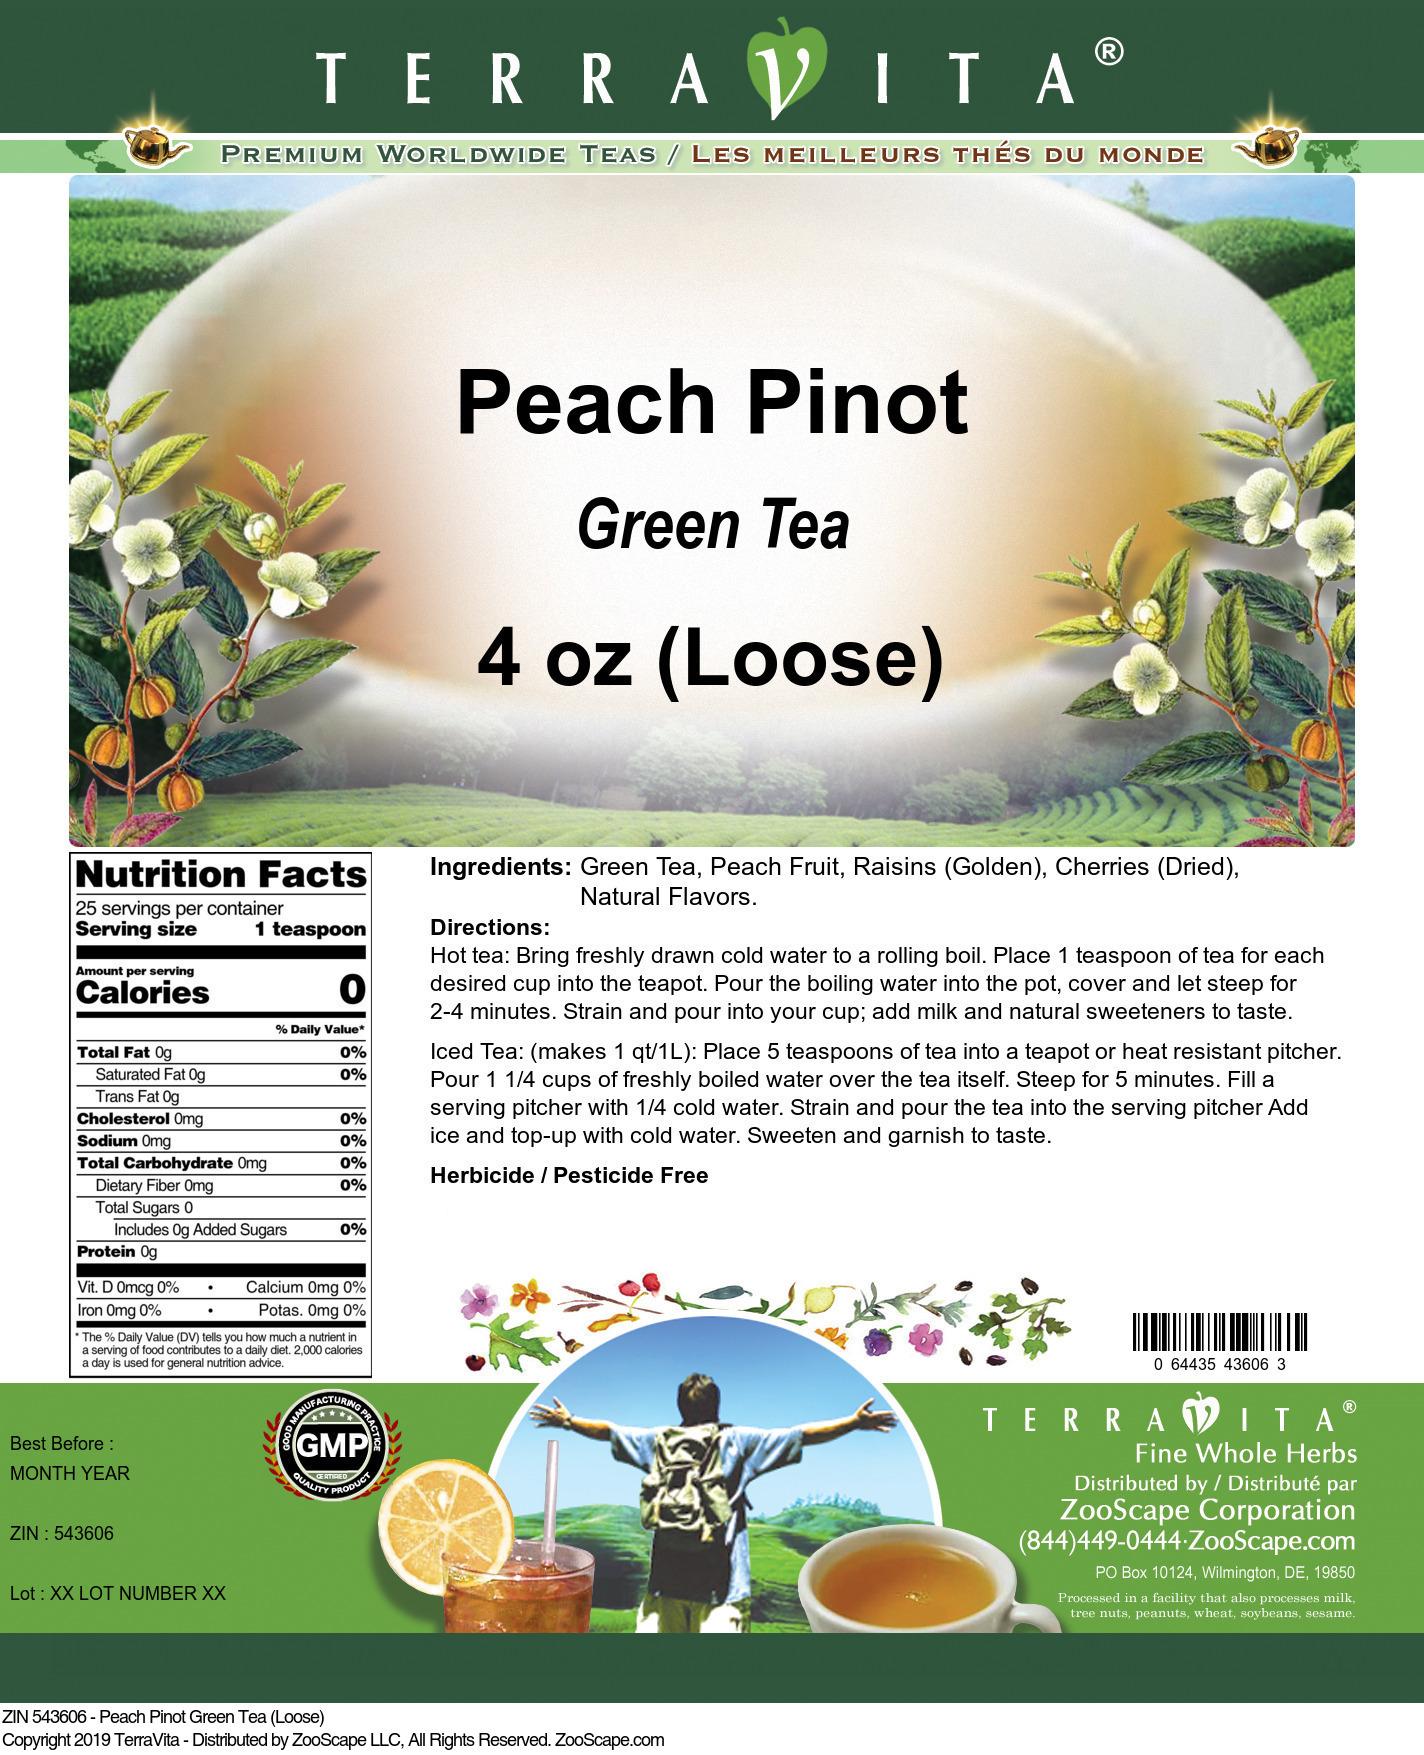 Peach Pinot Green Tea (Loose)